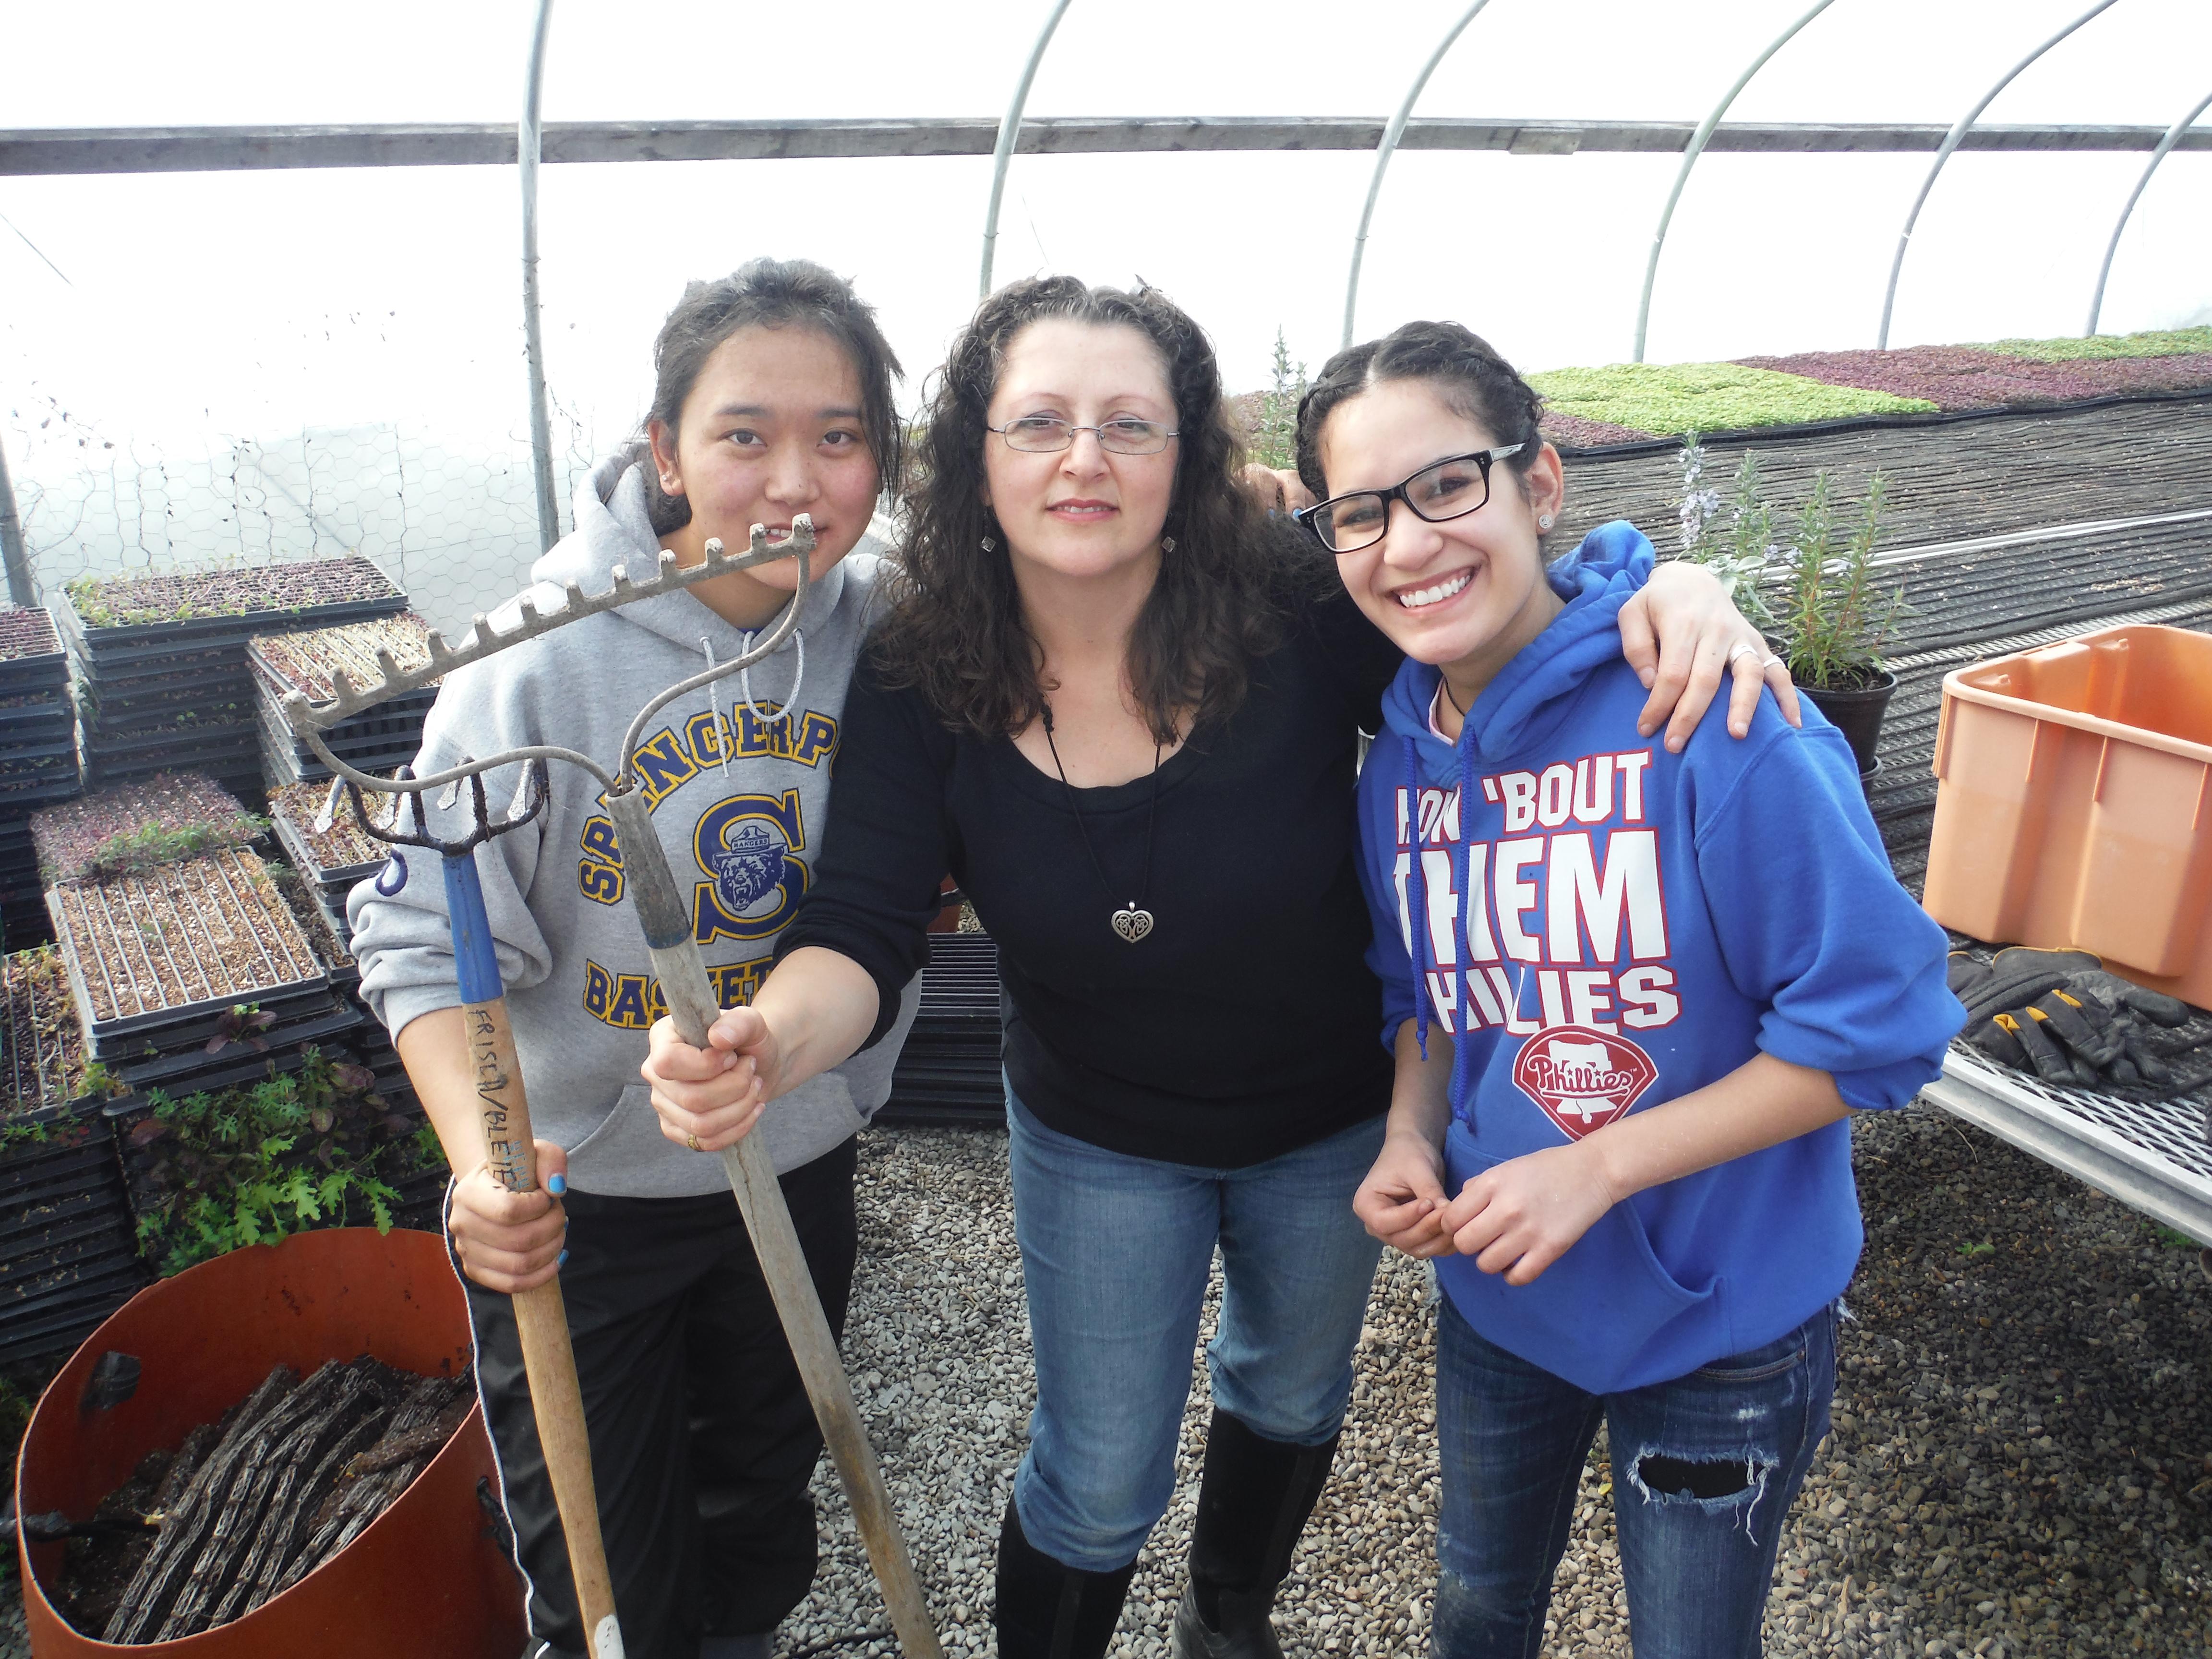 Eco-Gap Internship Program at EcoVillage Ithaca